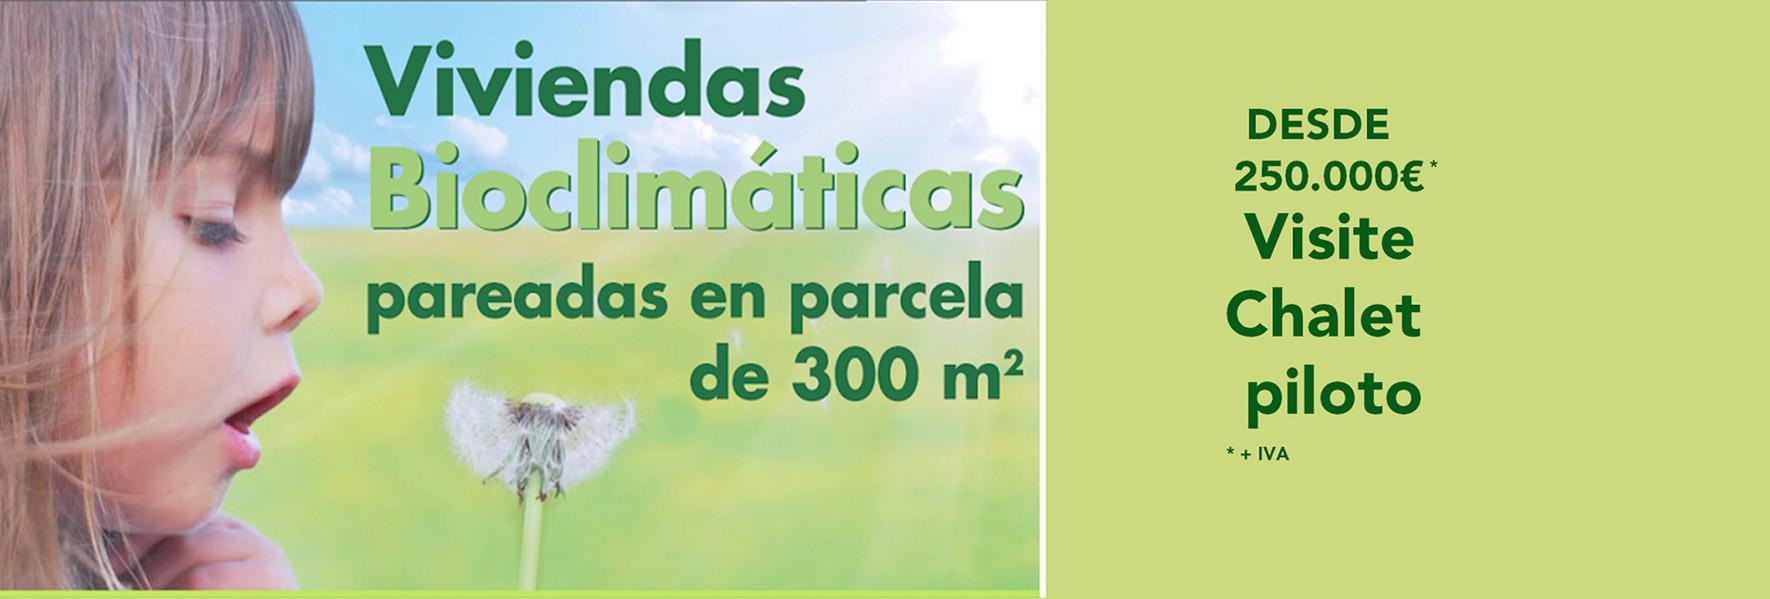 ViviendaBioclimatica_3